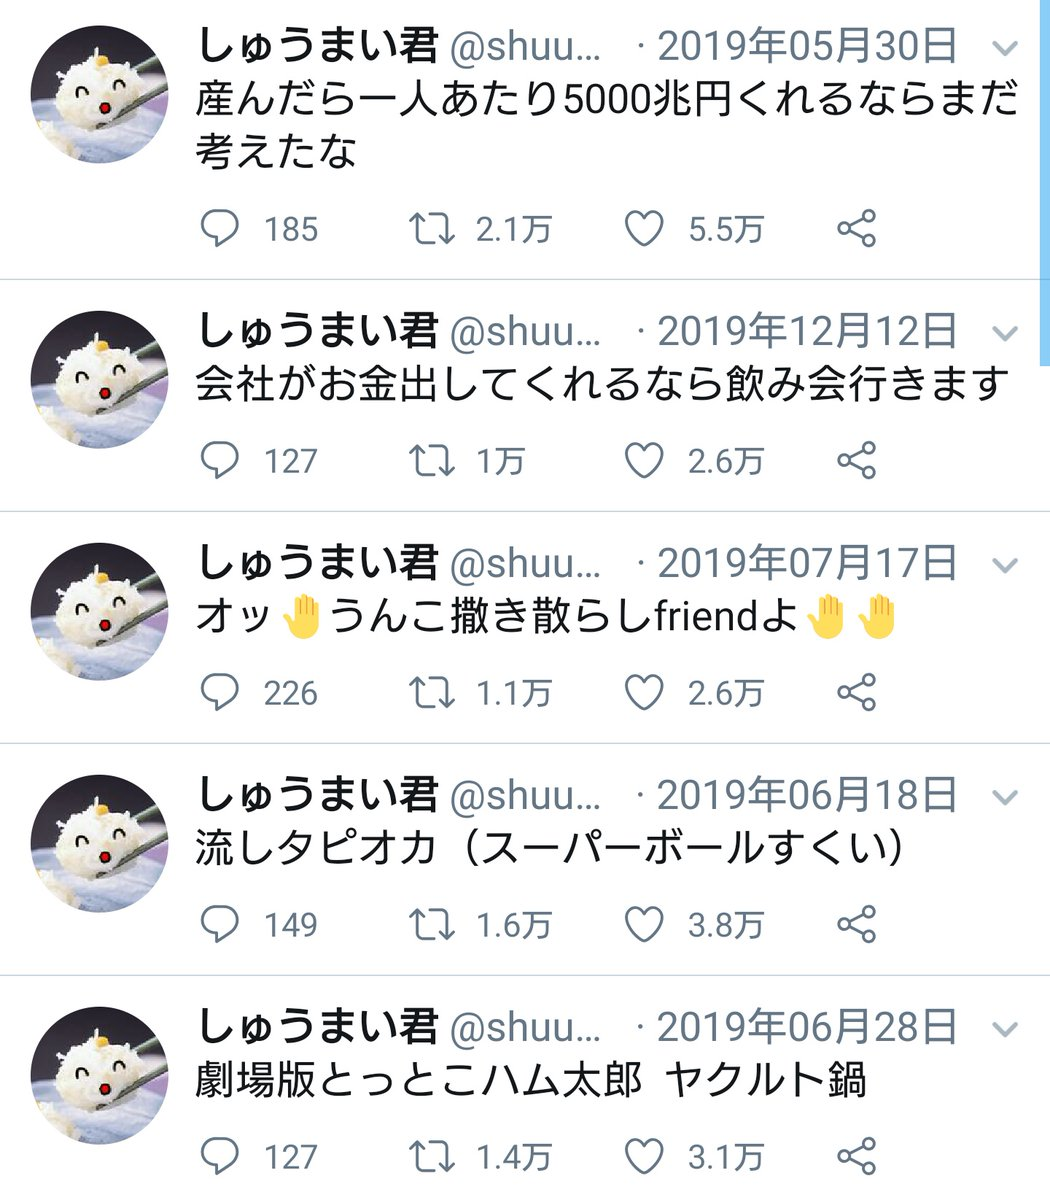 「from:shuumai min_faves:10000」で検索したときのキレッキレの検索結果好き